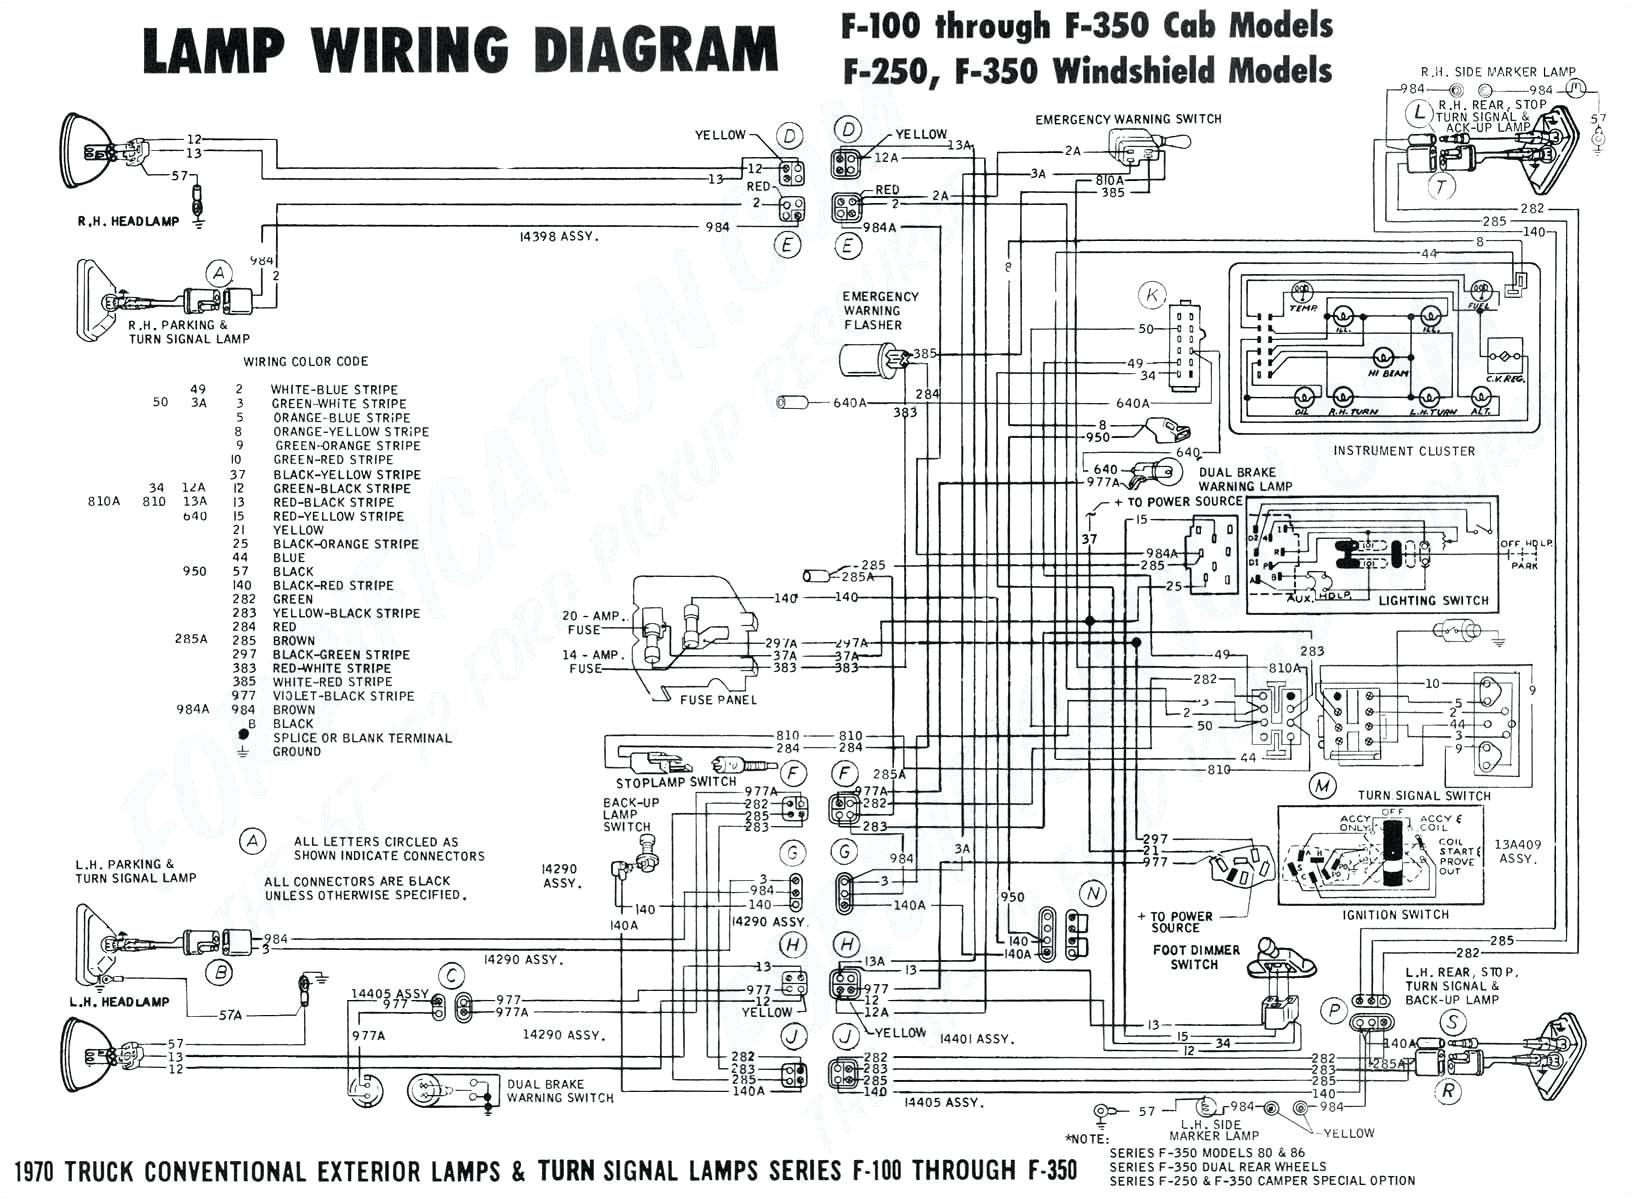 abb wiring diagrams free download diagram schematic wiring diagram abb wiring diagrams abb wiring diagrams